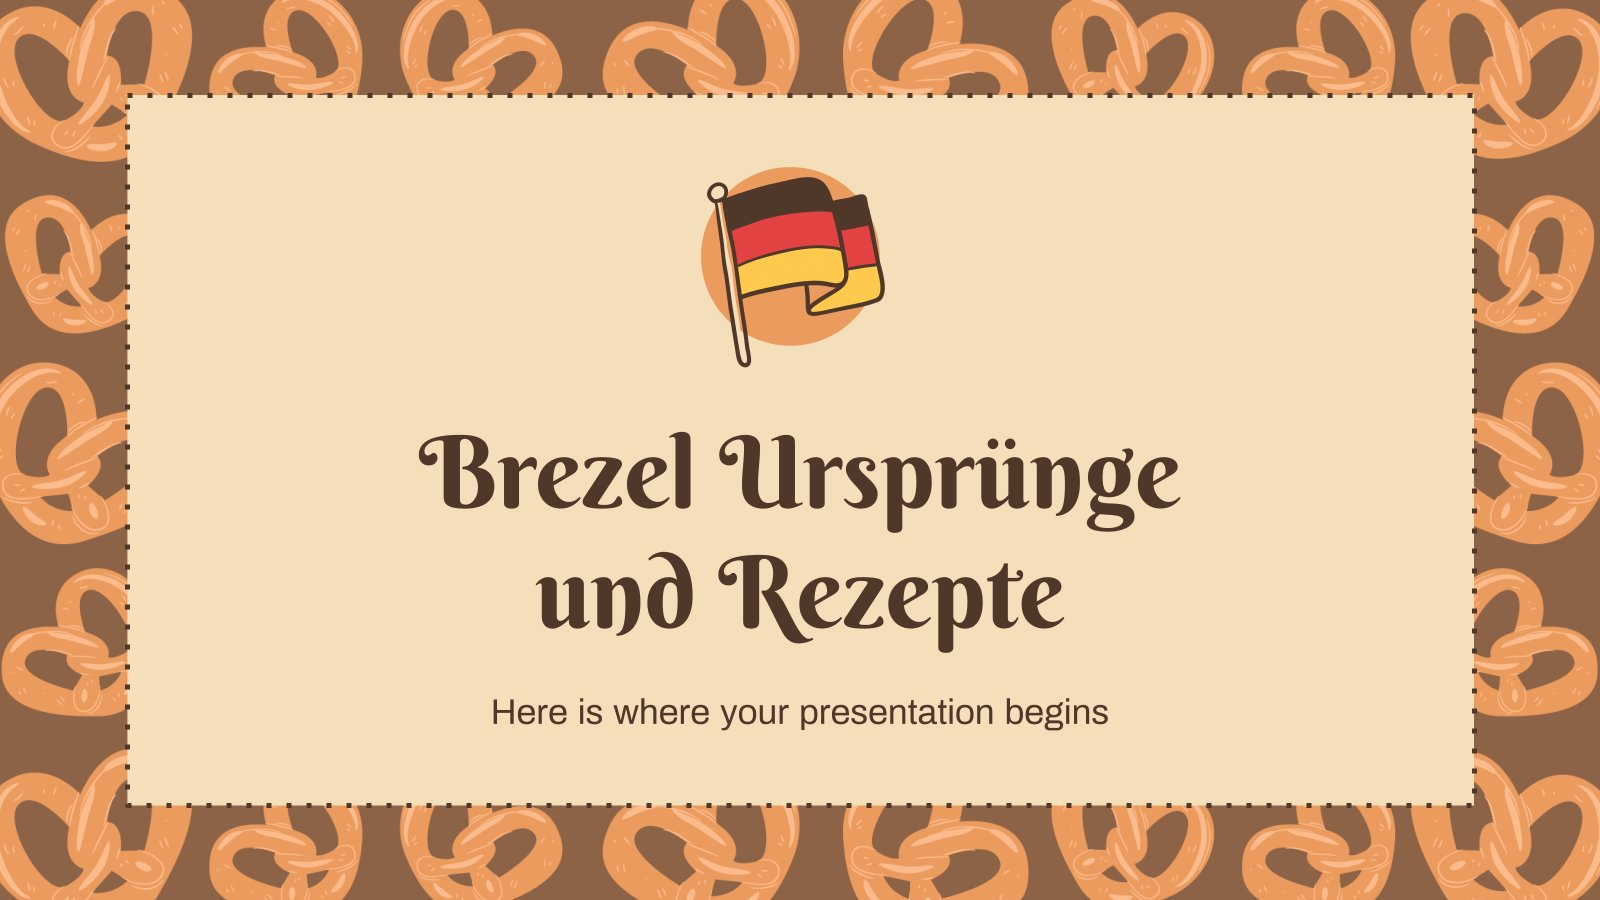 Plantilla de presentación Brezel Ursprünge und Rezepte